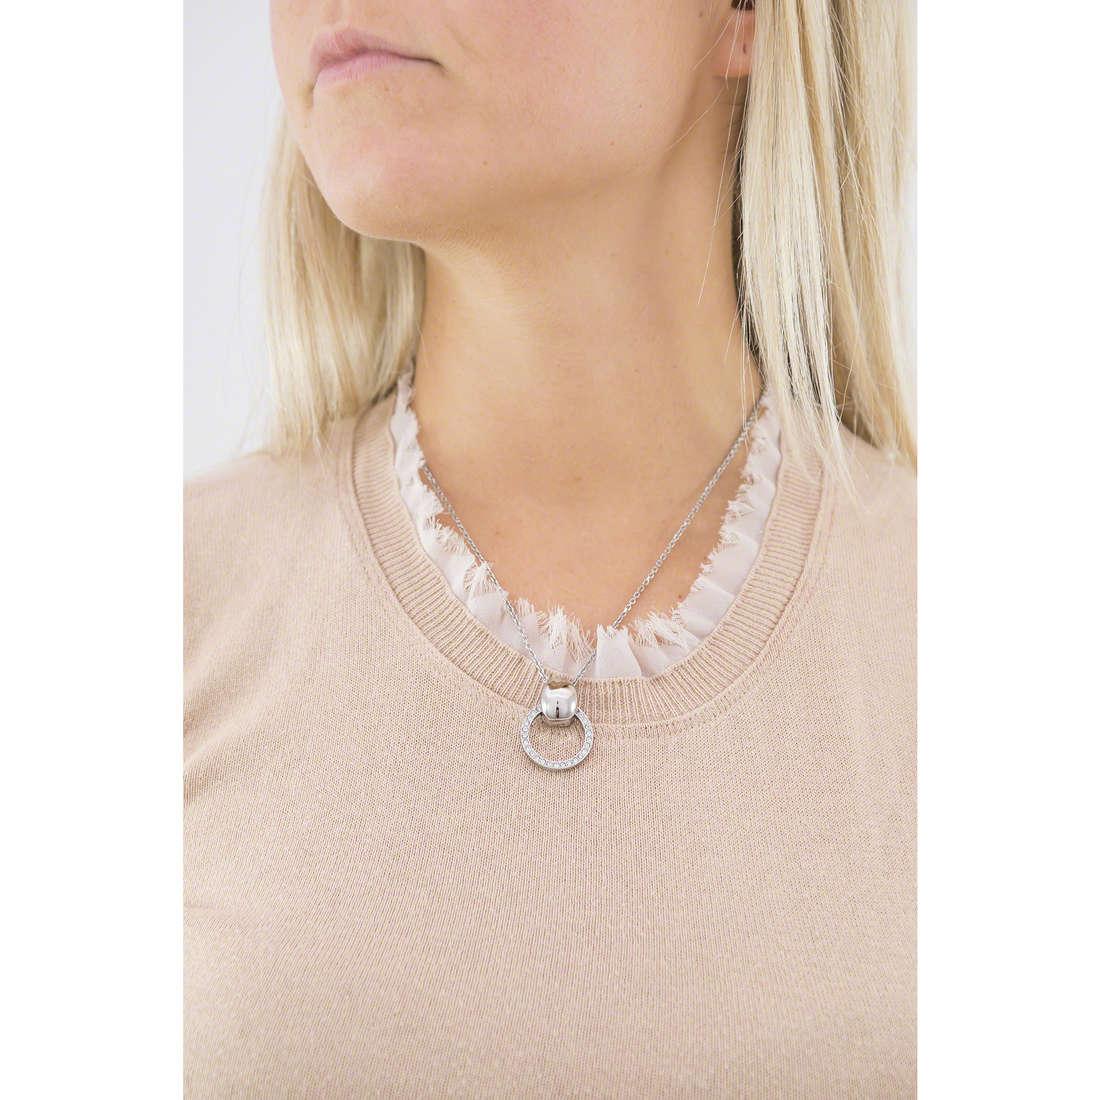 Breil colliers Breilogy femme TJ1684 indosso